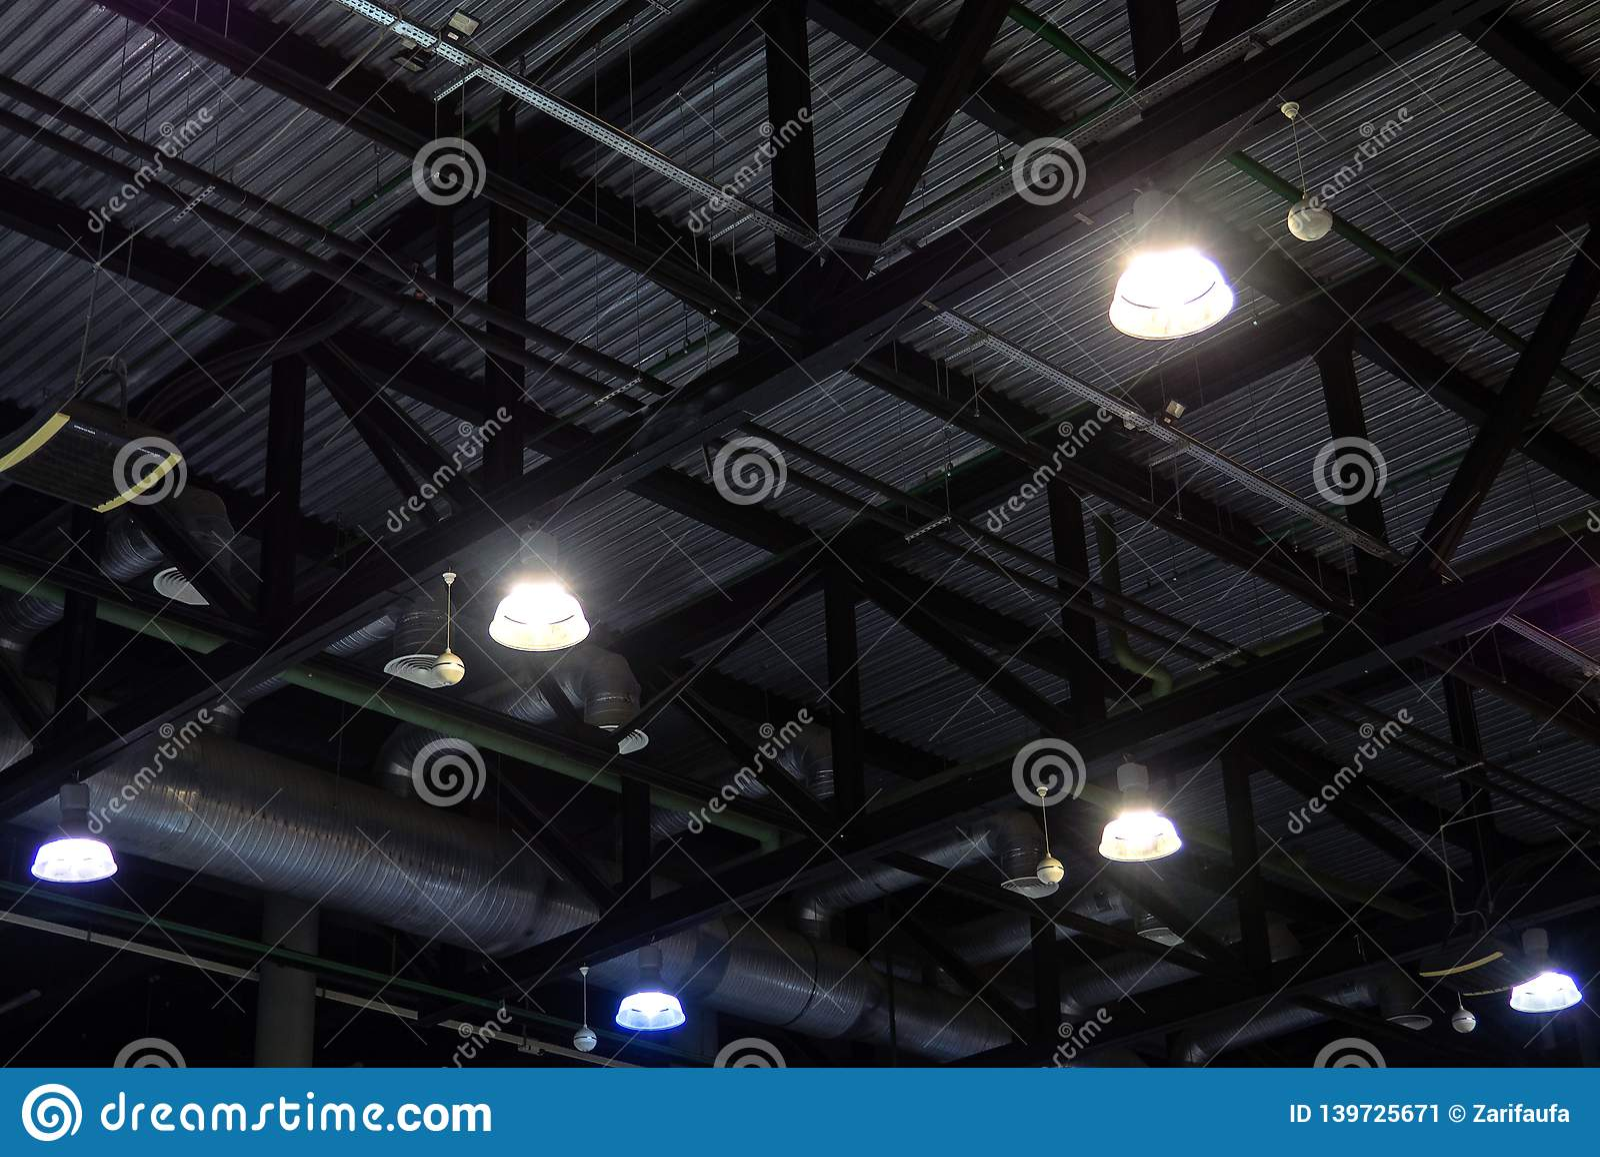 https www dreamstime com lights ventilation system ceiling dark office industrial building lights ventilation system ceiling image139725671